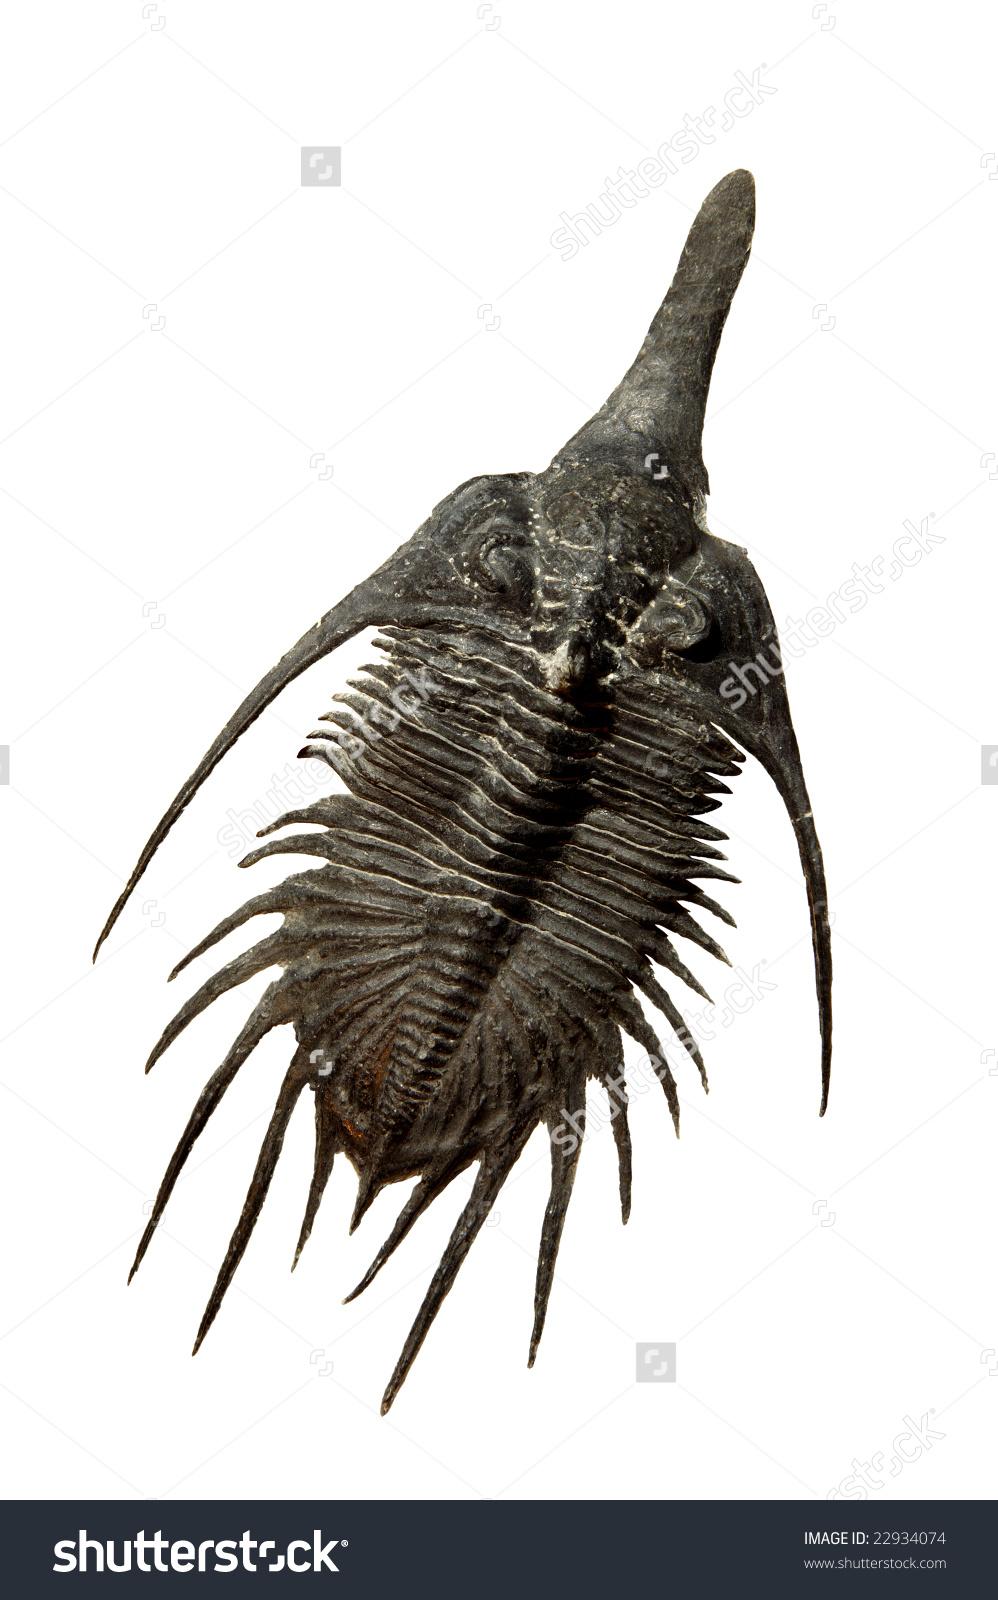 Psychopyge Elegans Trilobite From Lower Devonian Formation In.